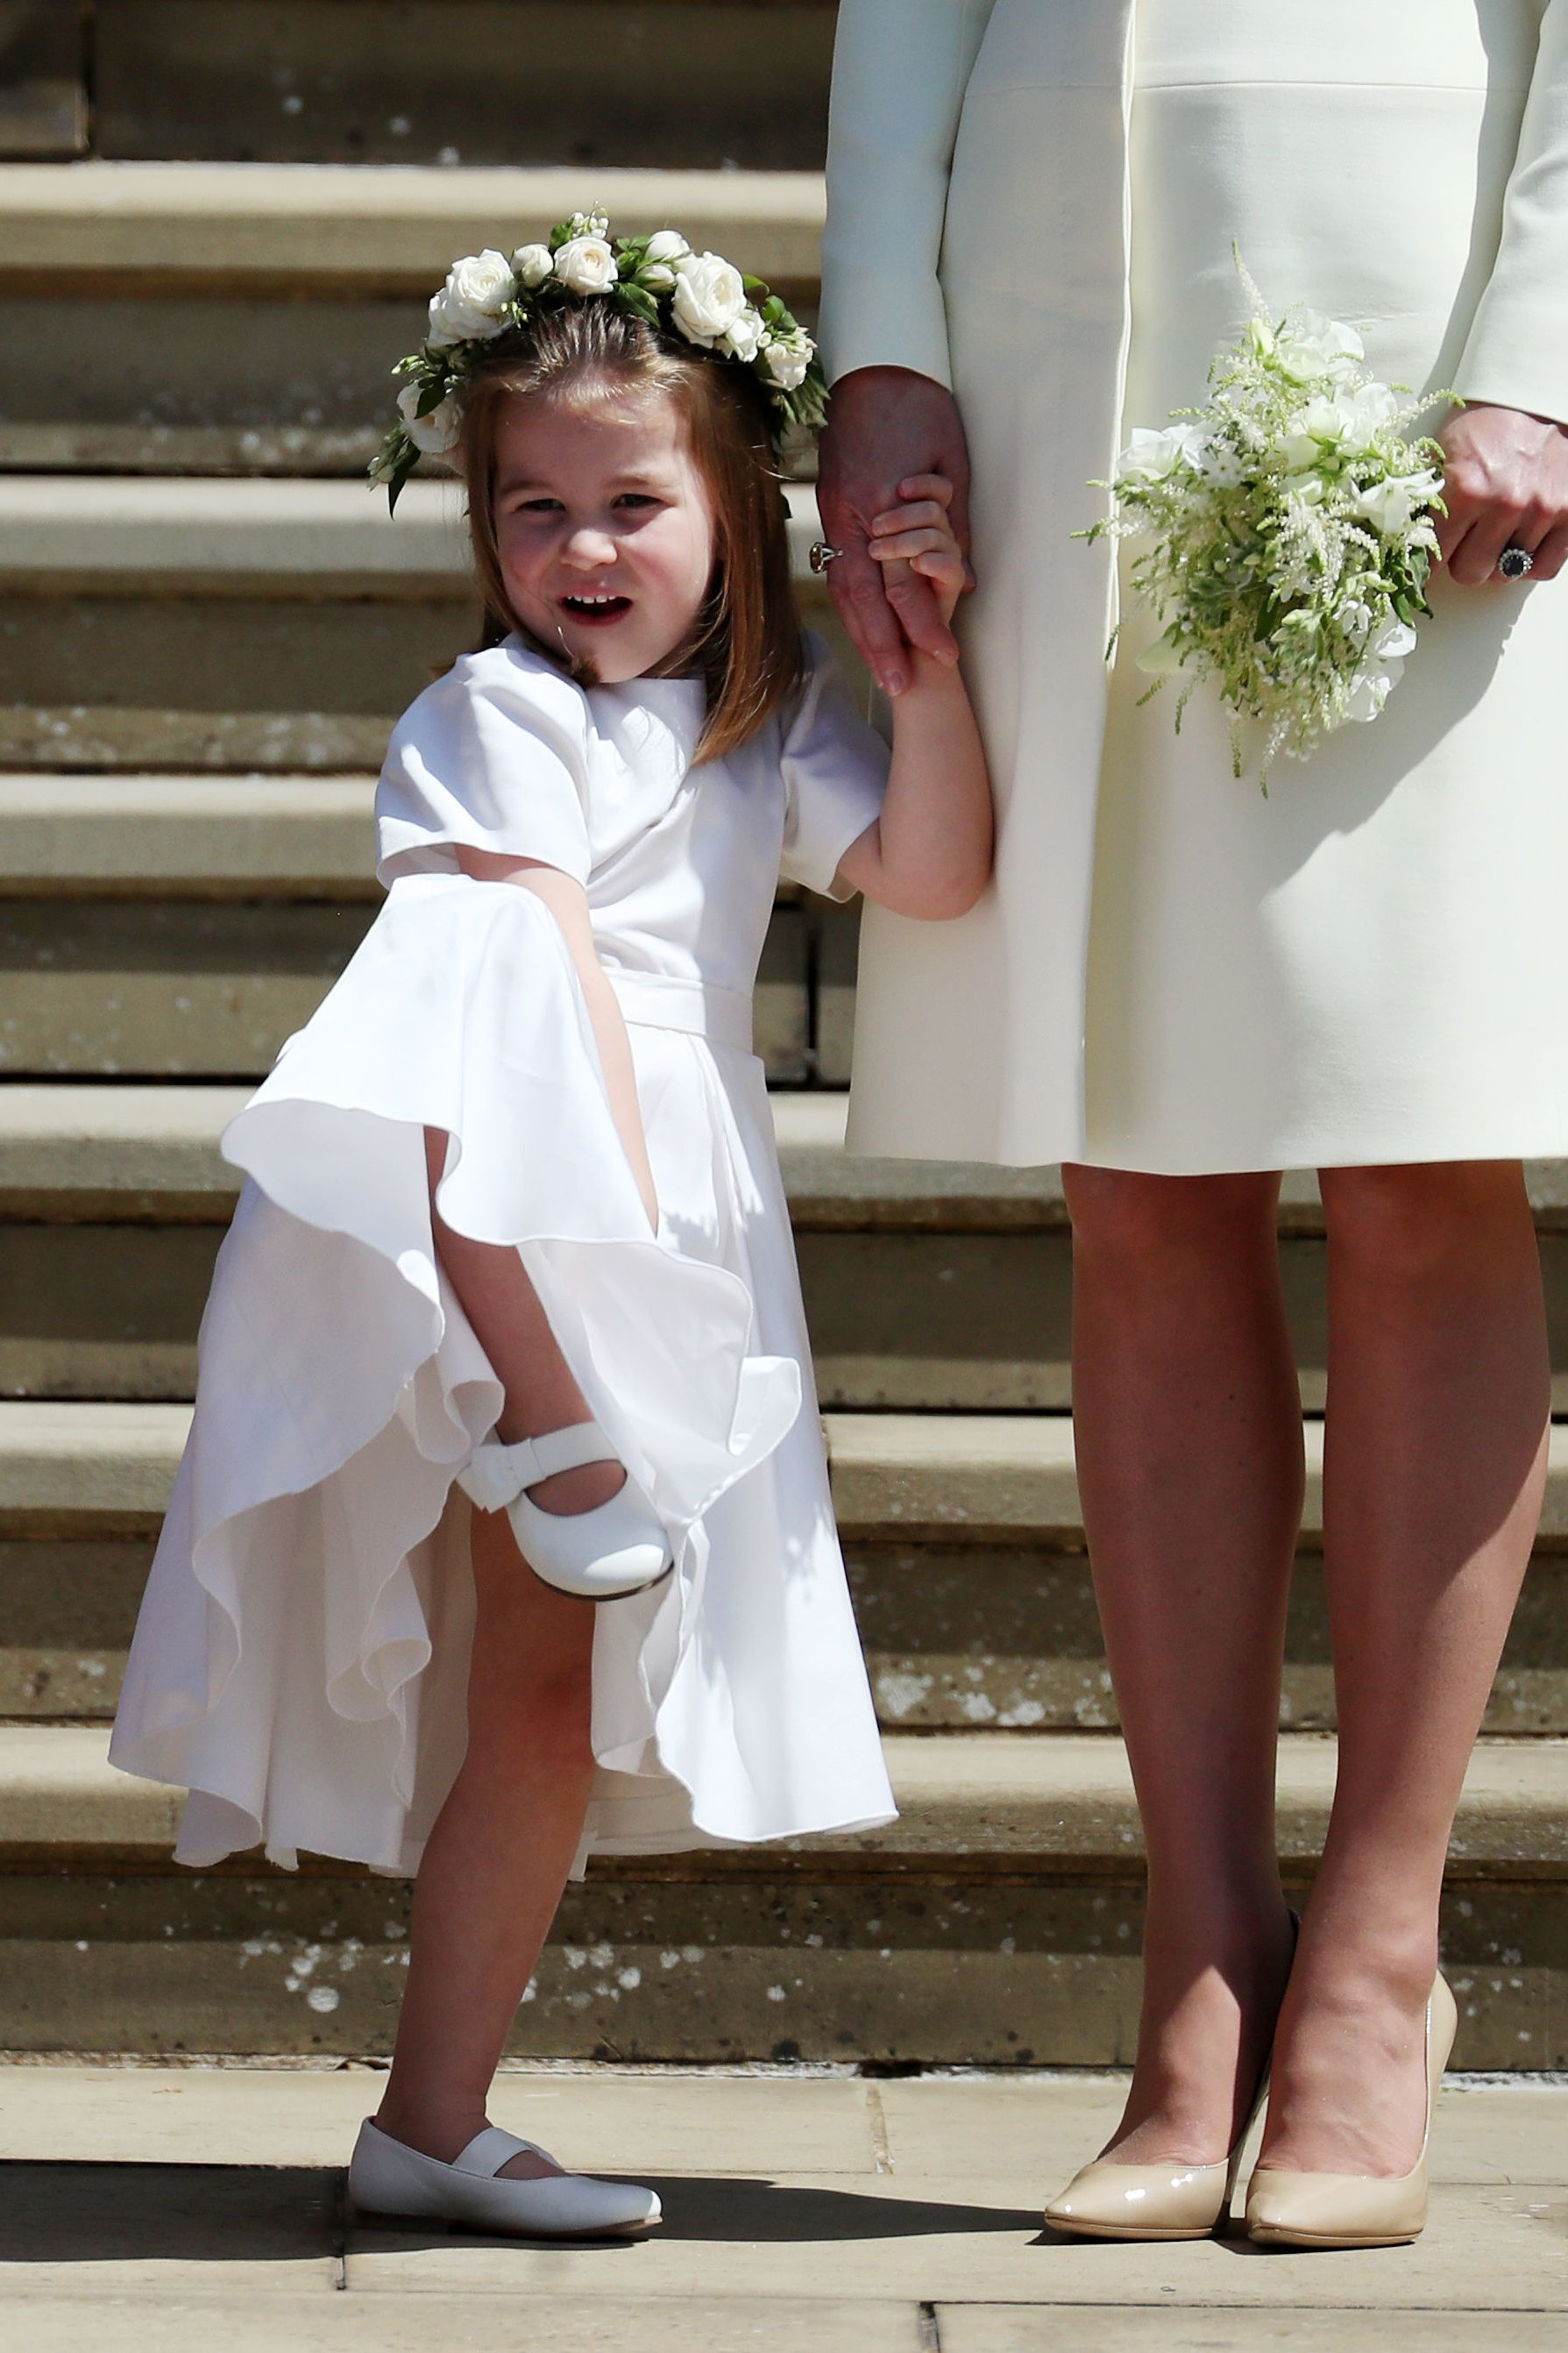 royal wedding 2018 princess charlotte shoes